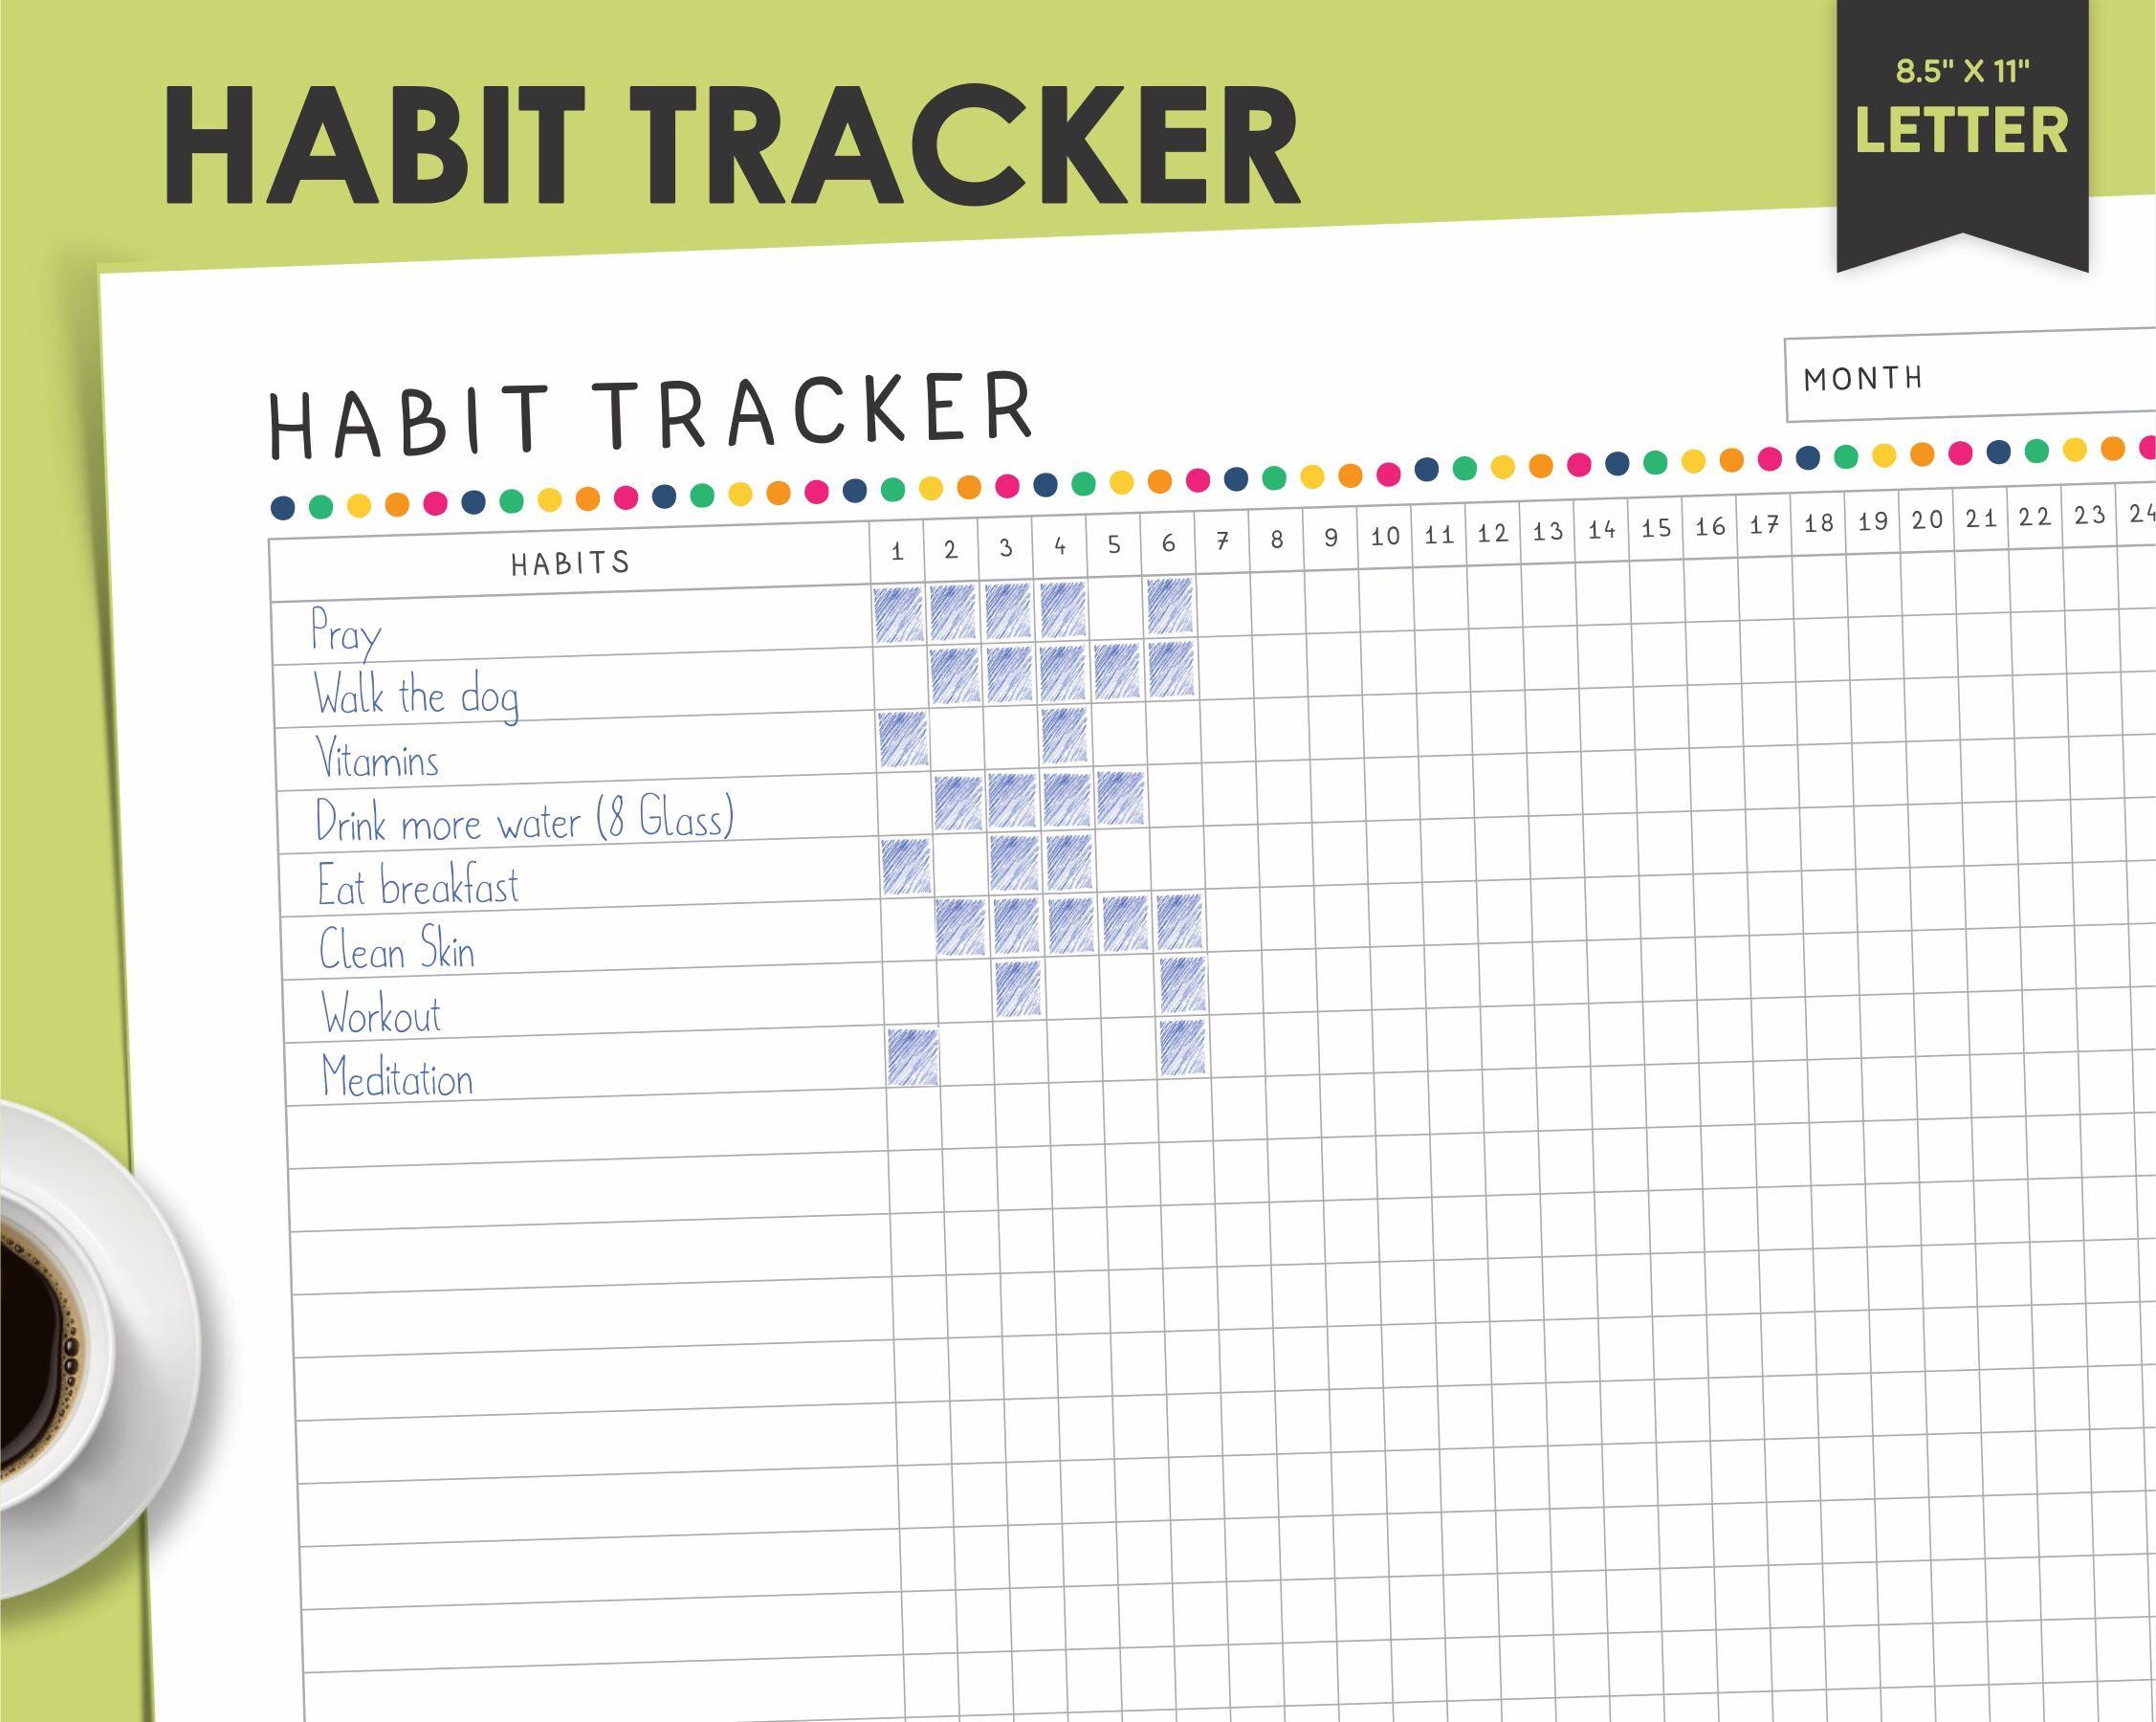 habit tracker goal tracker 30 day challenge healthy habits habit